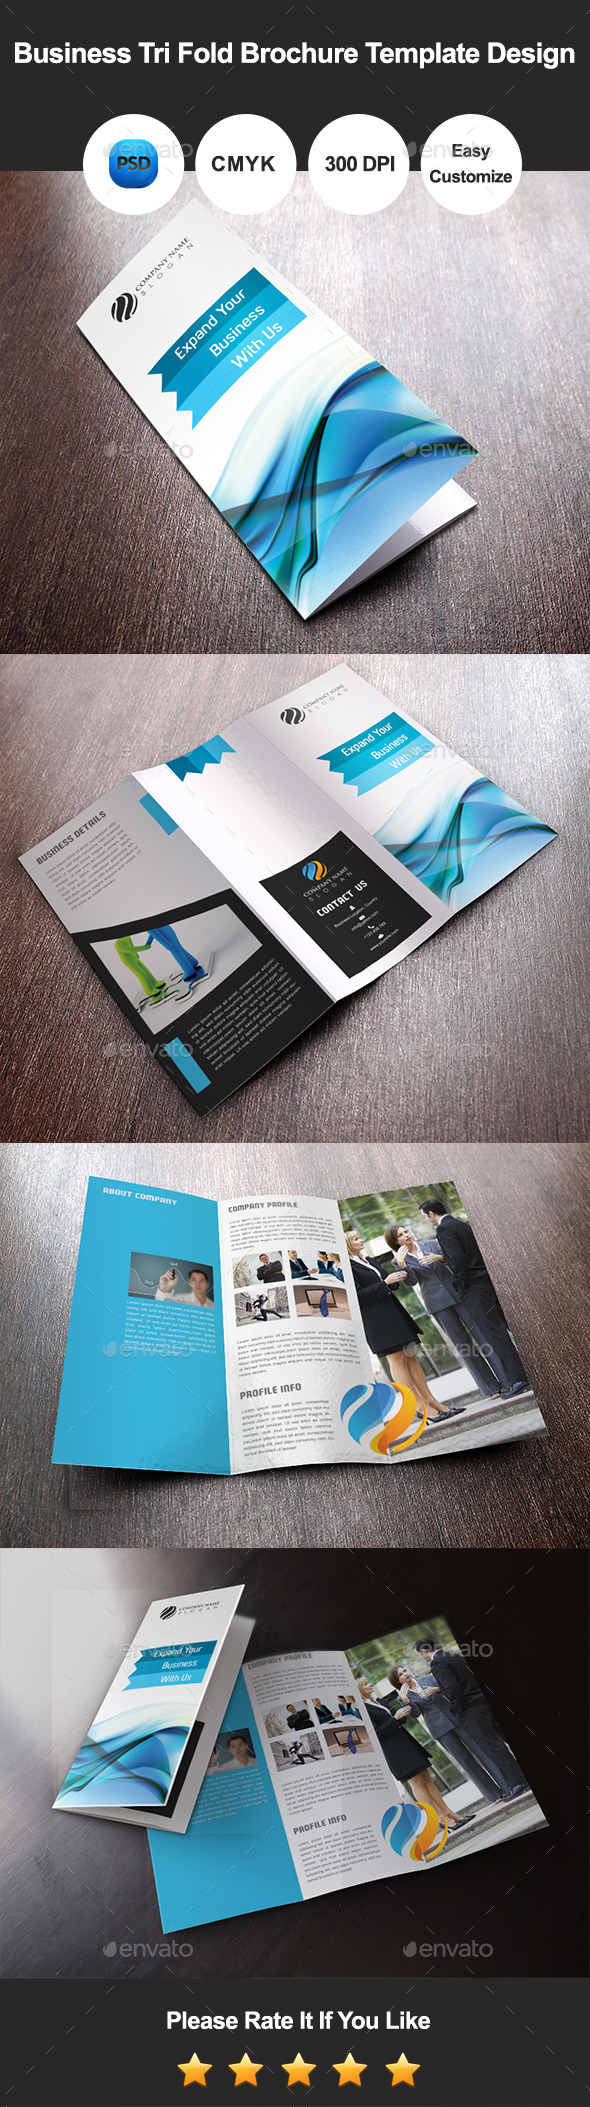 GraphicRiver Business Tri Fold Brochure Template Design 9684420